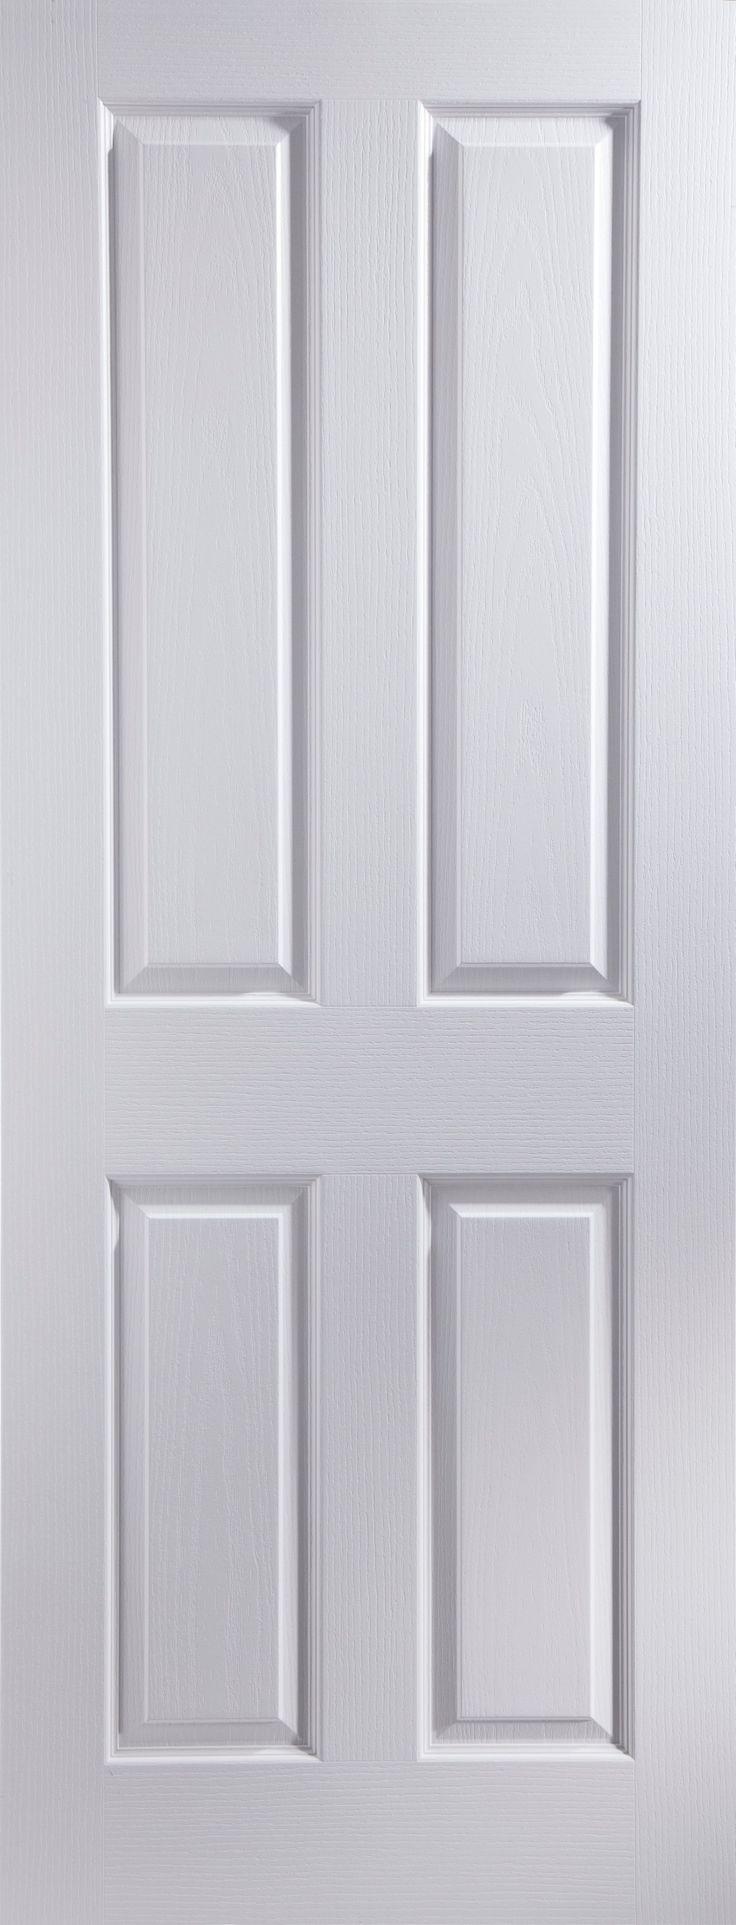 Top 25 Ideas About White Internal Doors On Pinterest